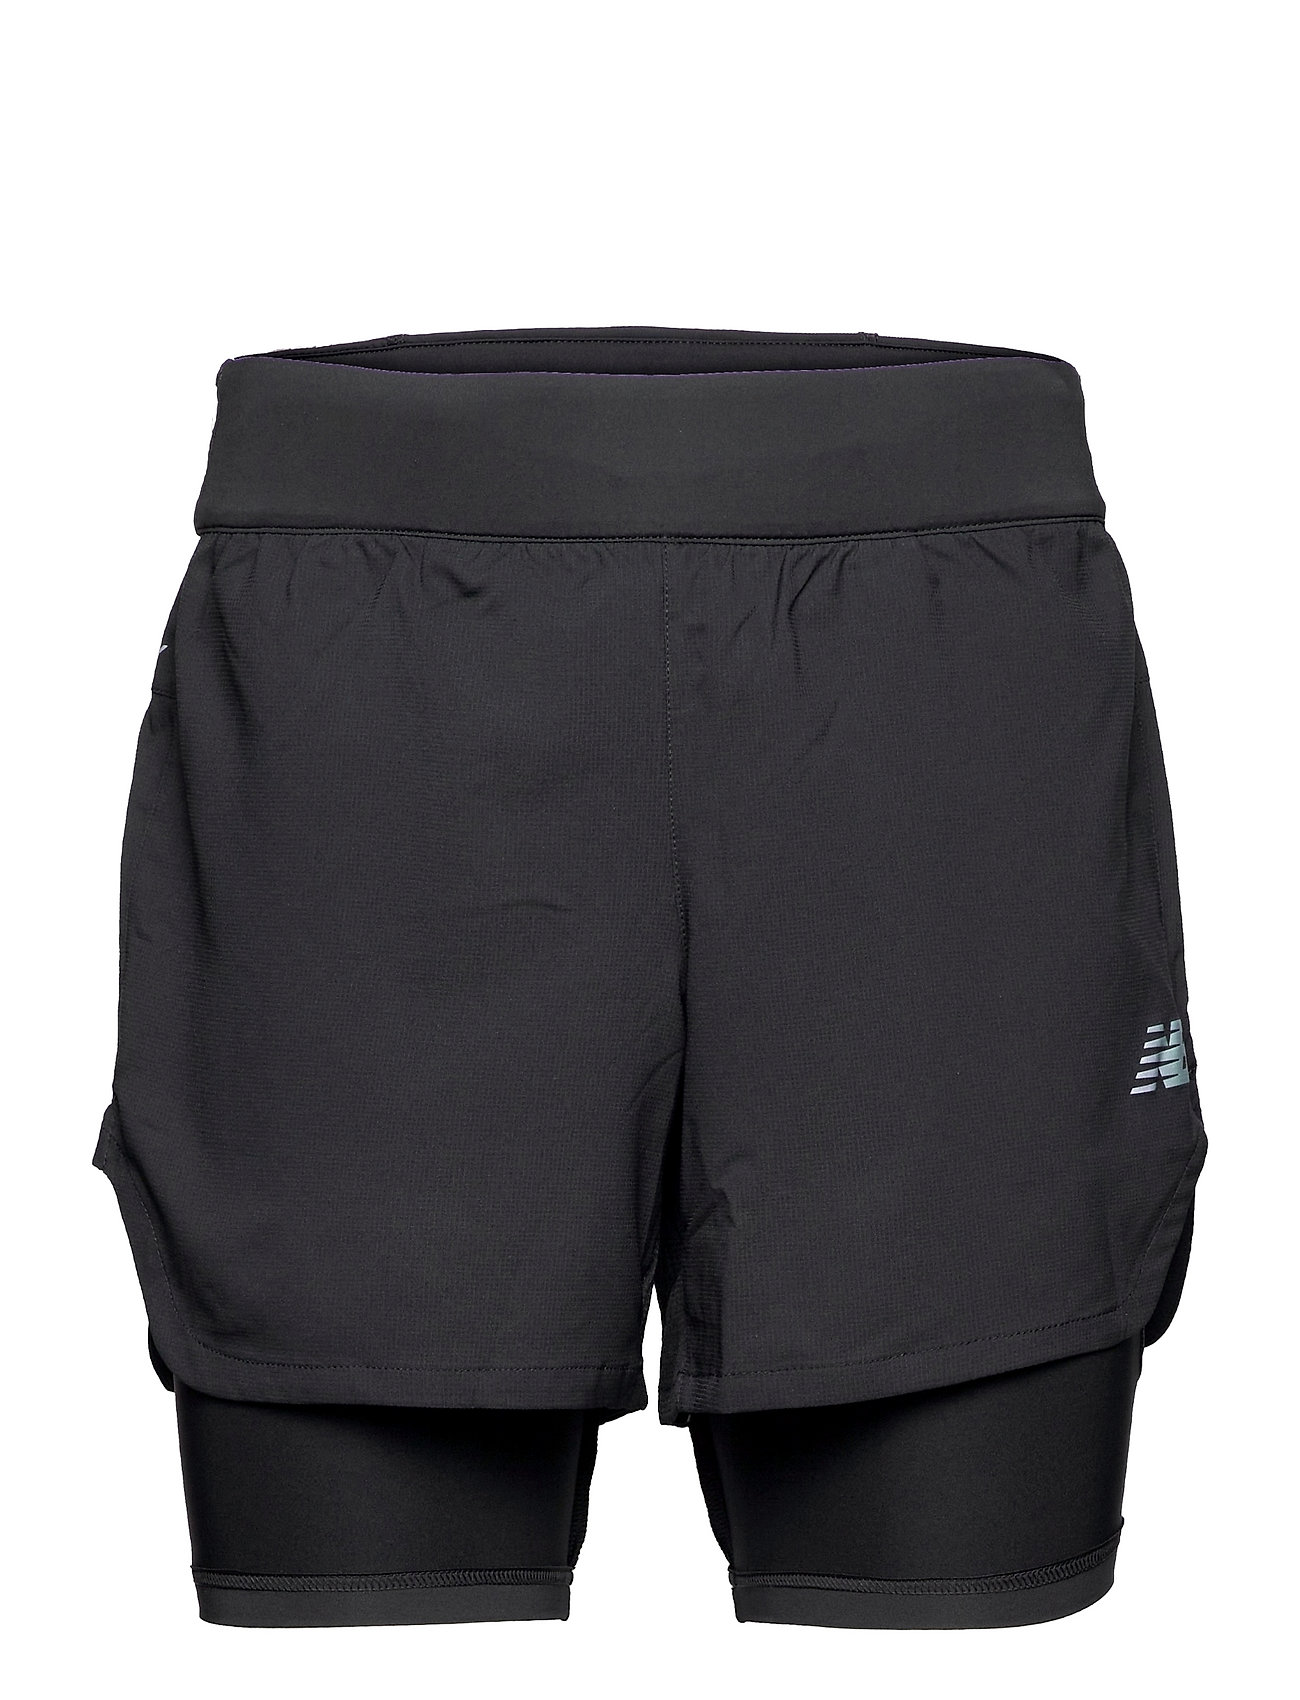 Q Speed Fuel 2 In 1 5 Inch Short Shorts Sport Shorts Sort New Balance